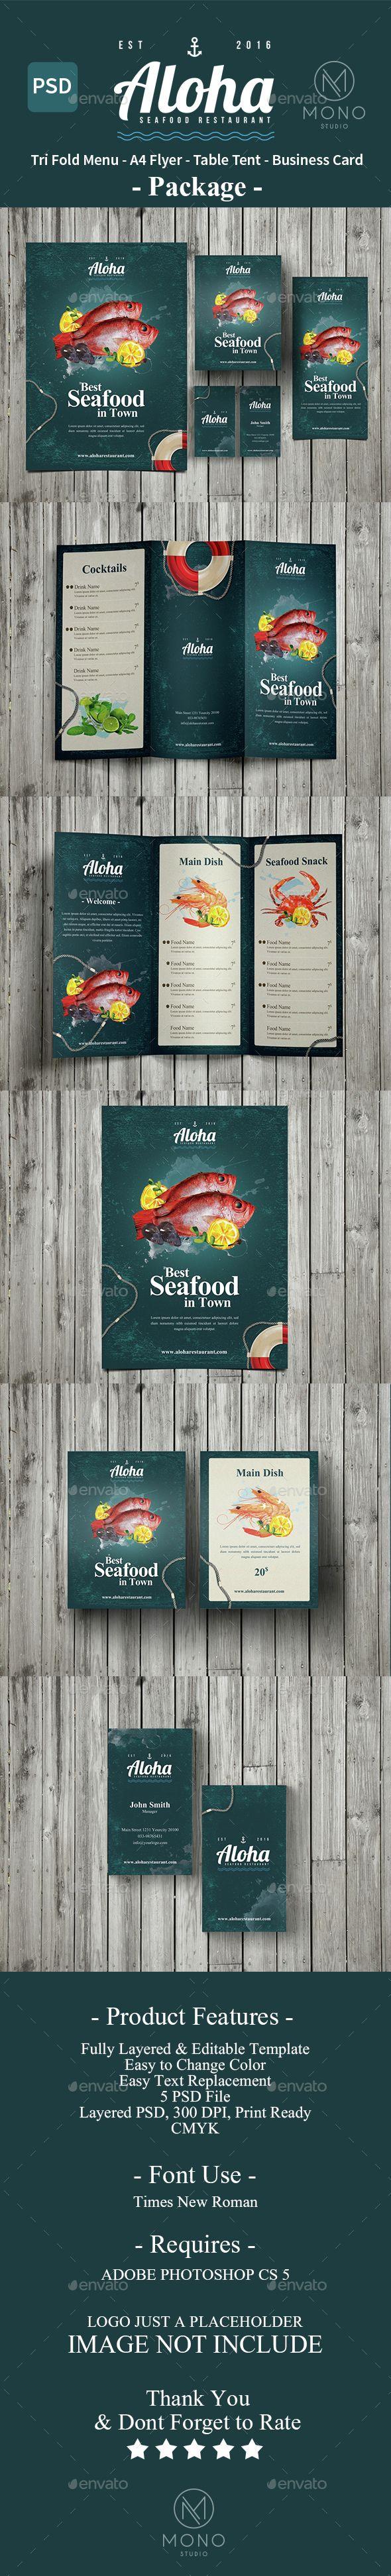 Seafood Menu Package Templates PSD. Download here: http://graphicriver.net/item/seafood-menu-package/14188835?ref=ksioks